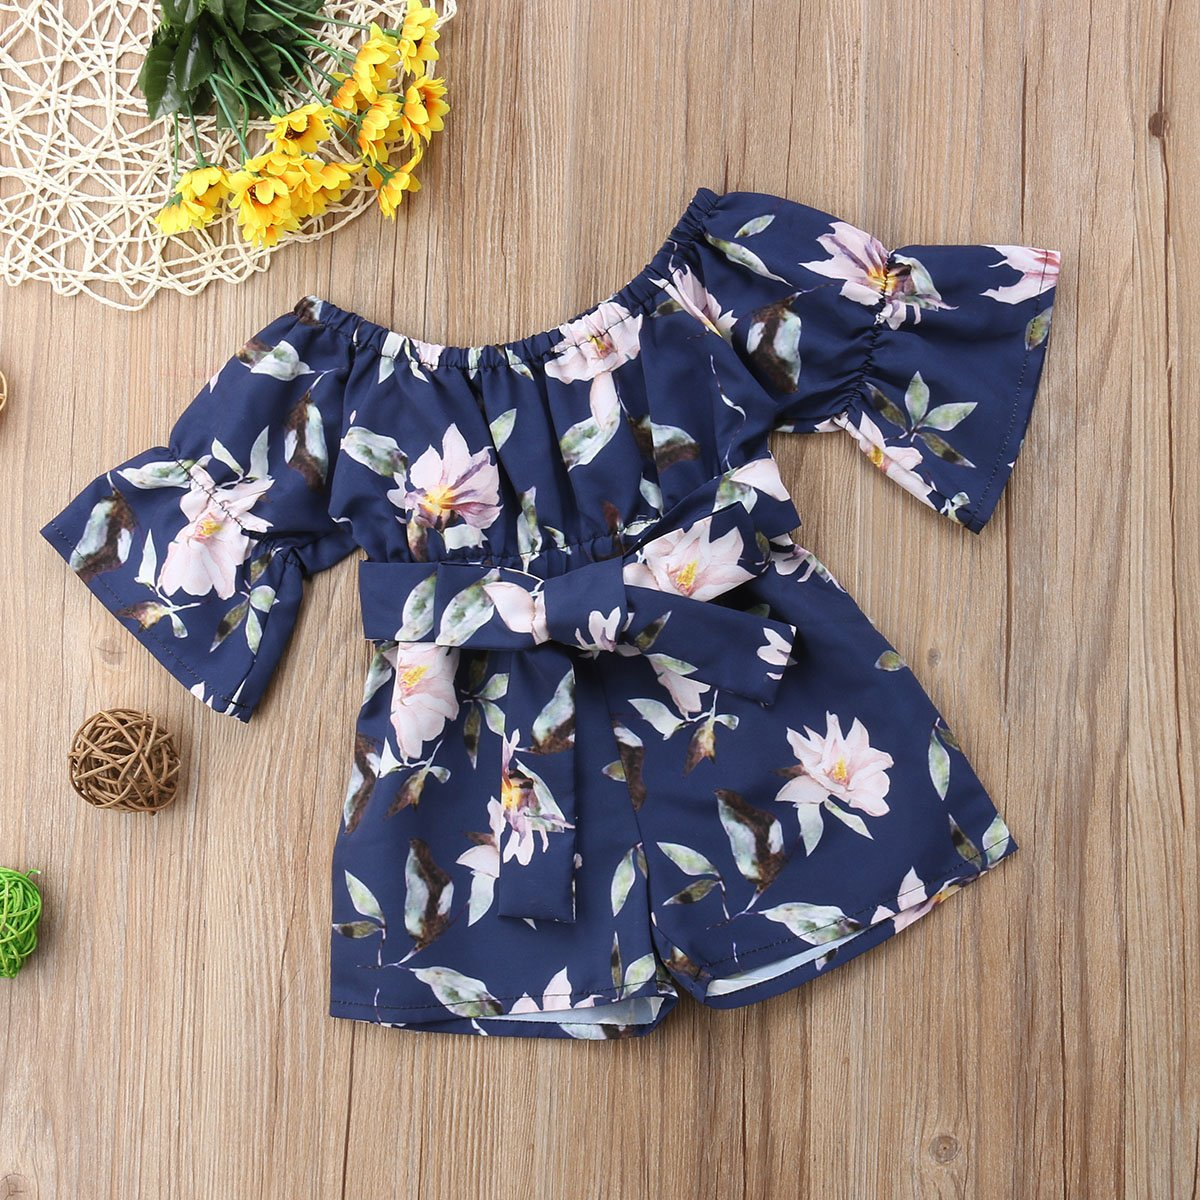 c3cd14a0056e Amazon.com  Toddler Baby Girls Floral Romper Playsuit Kids Bandage Off  Shoulder Jumpsuits  Clothing